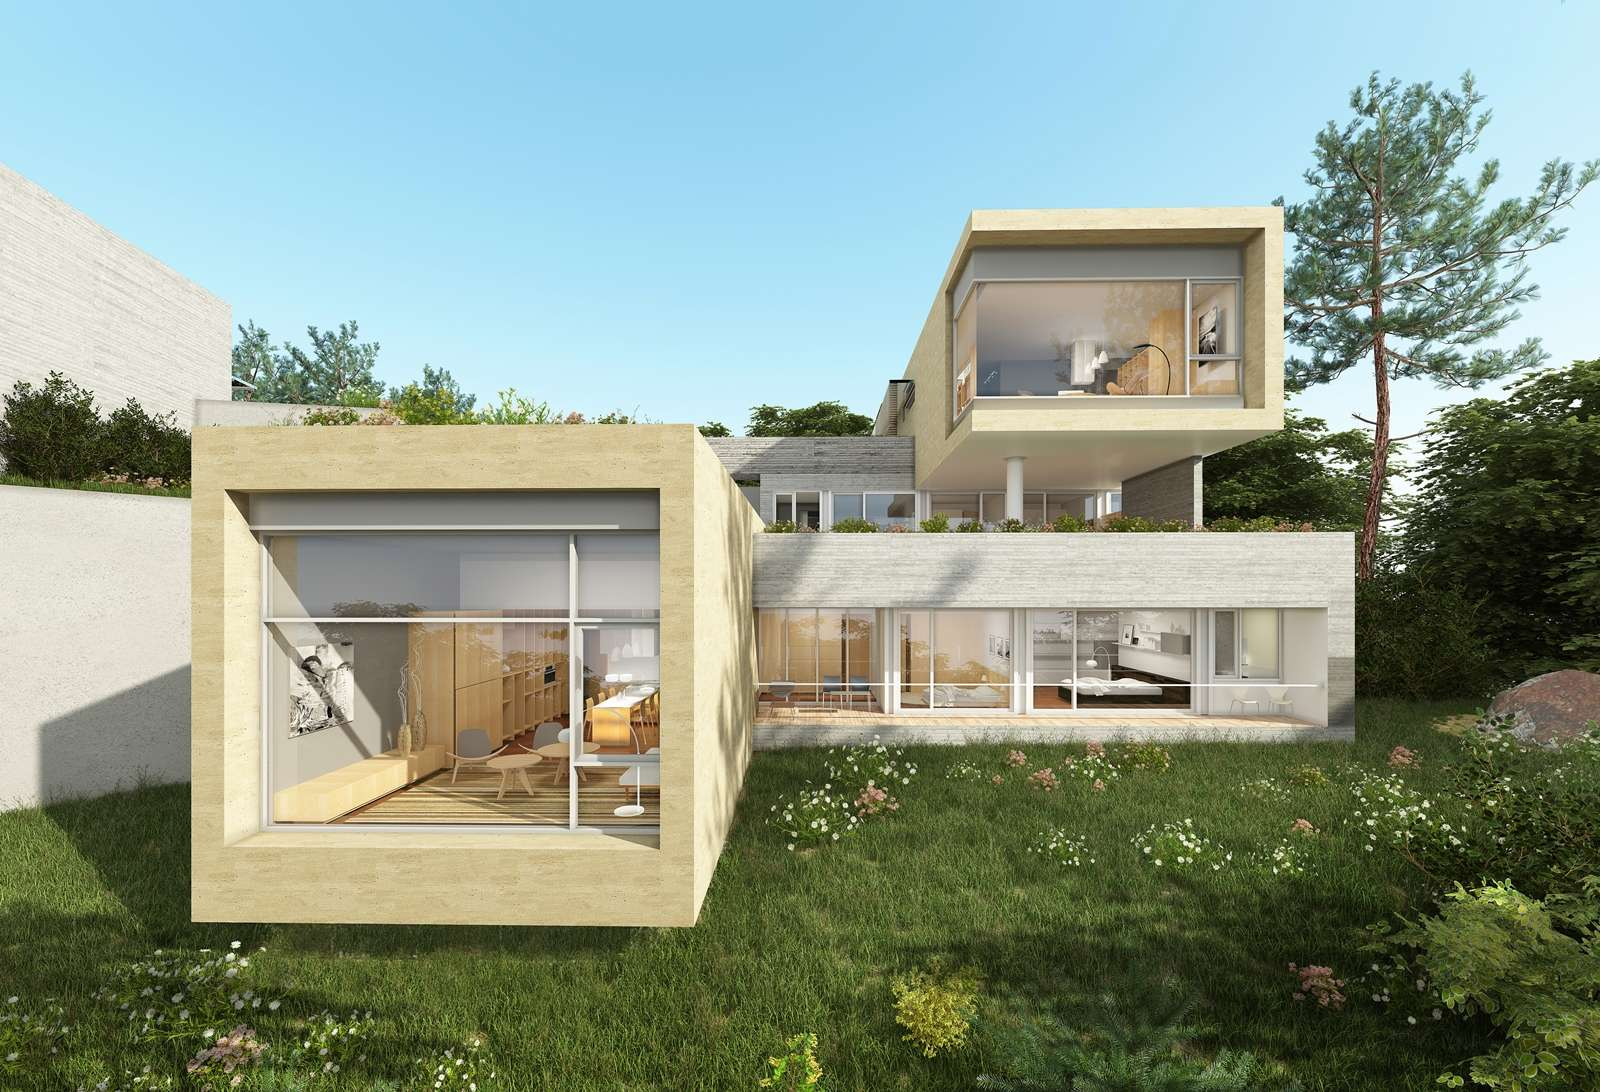 Desain Rumah Mewah Ala Korea Contemporary House Design Architecture House Modern Contemporary Homes